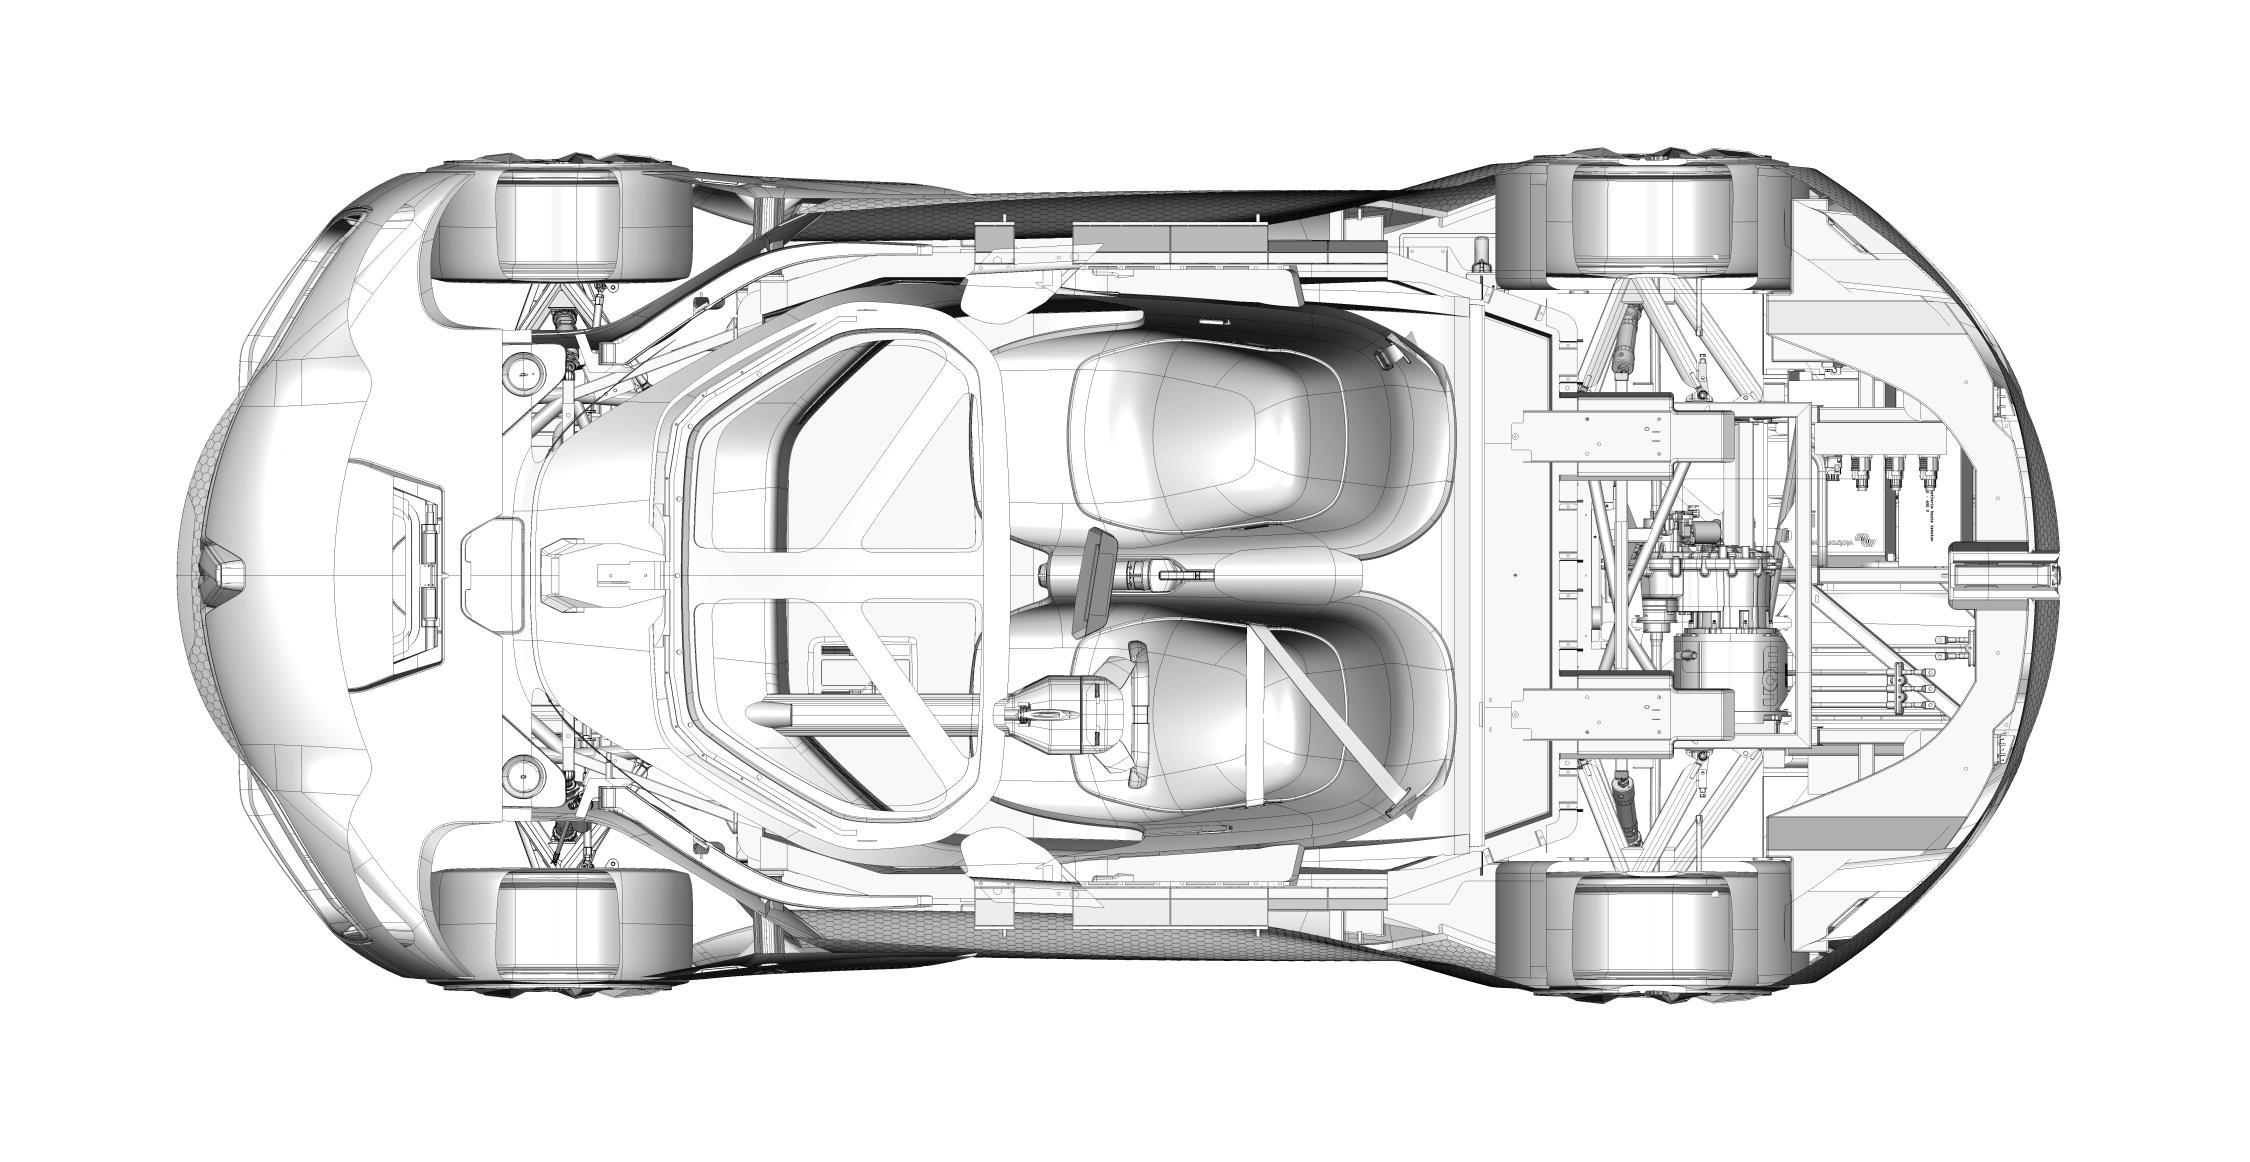 Trezor Concept - EMBARGO 08h15 UK Time 290916 (22).JPG